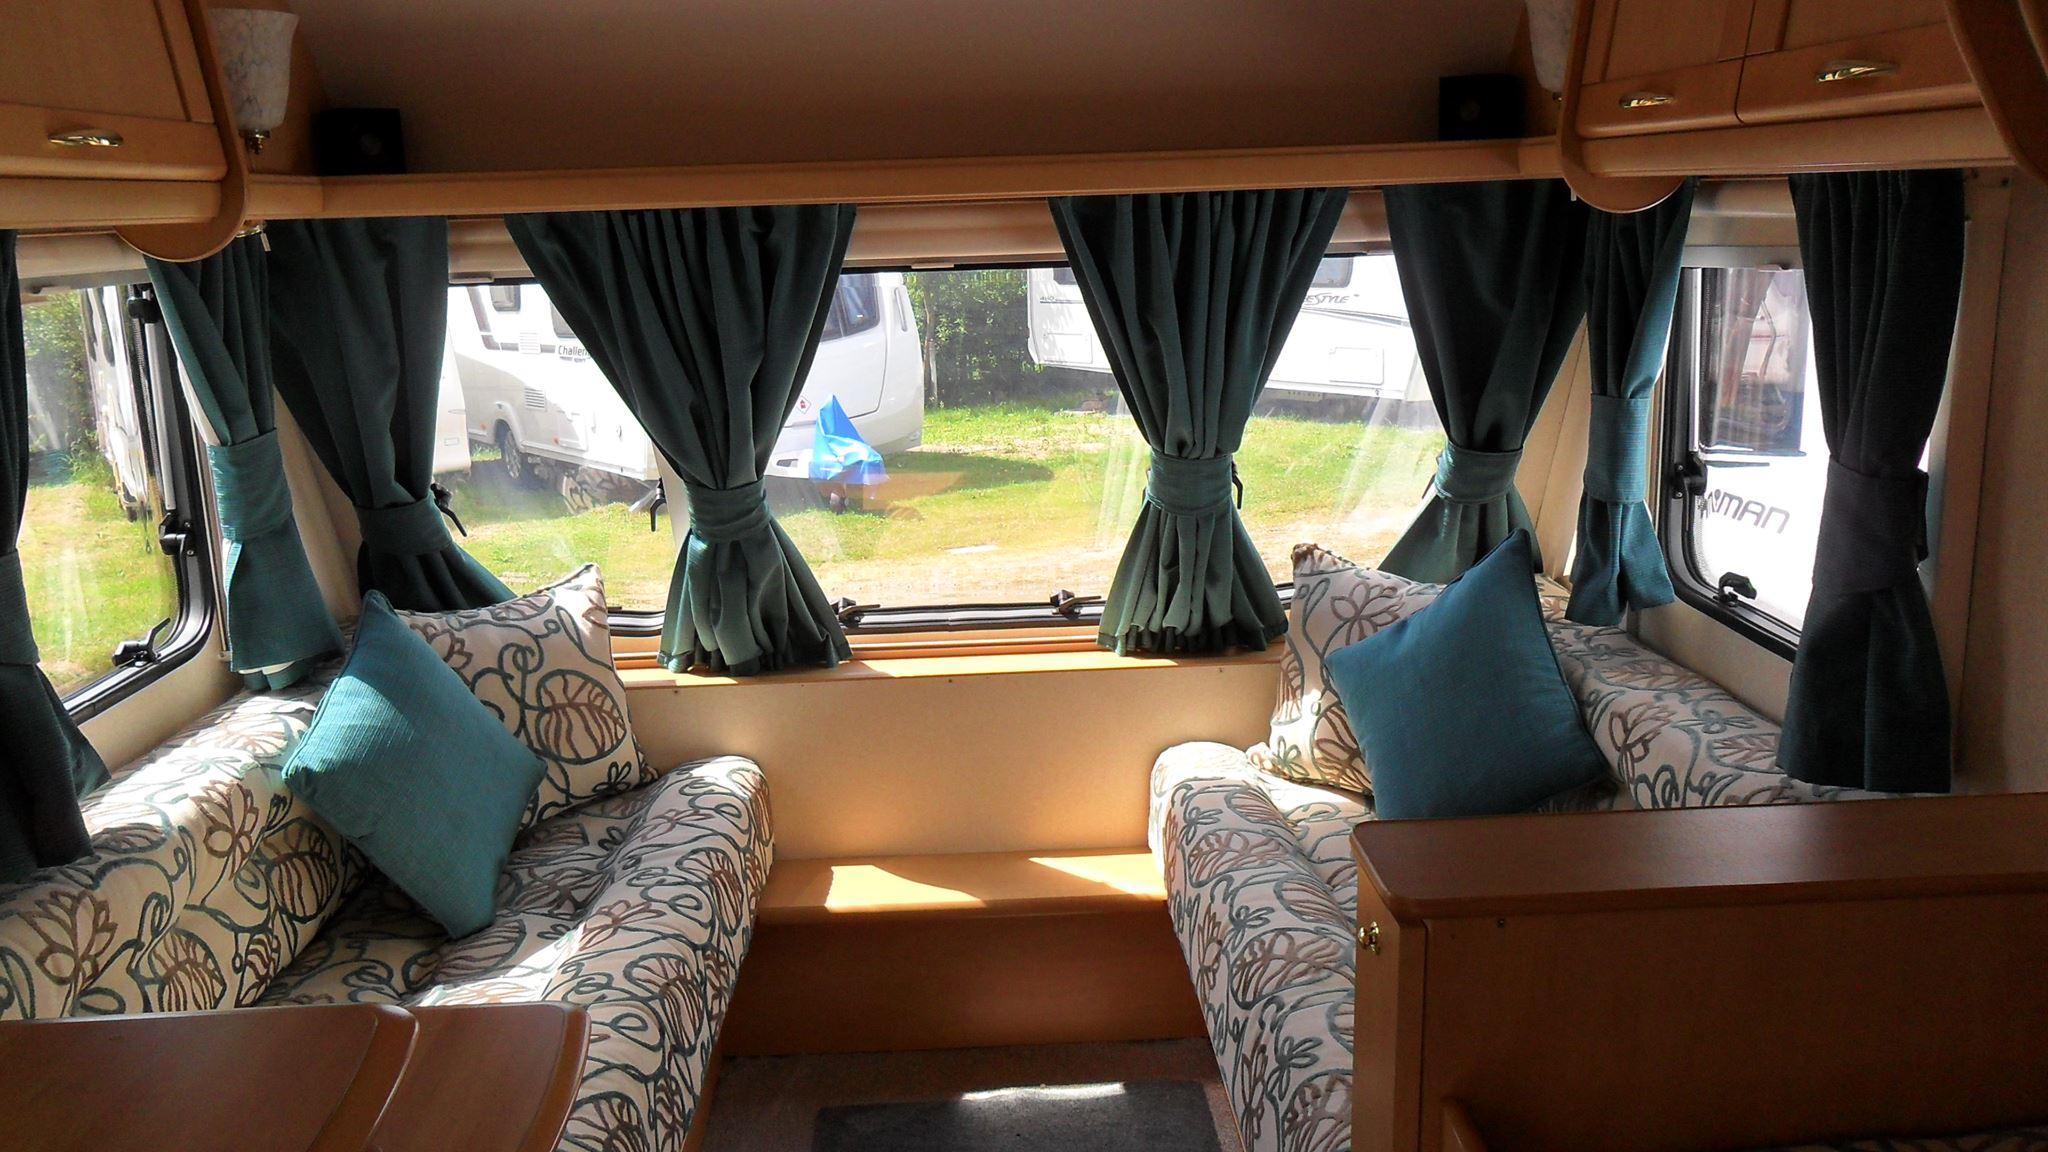 Caravan Upholstery Services Motorhome Boat Interior